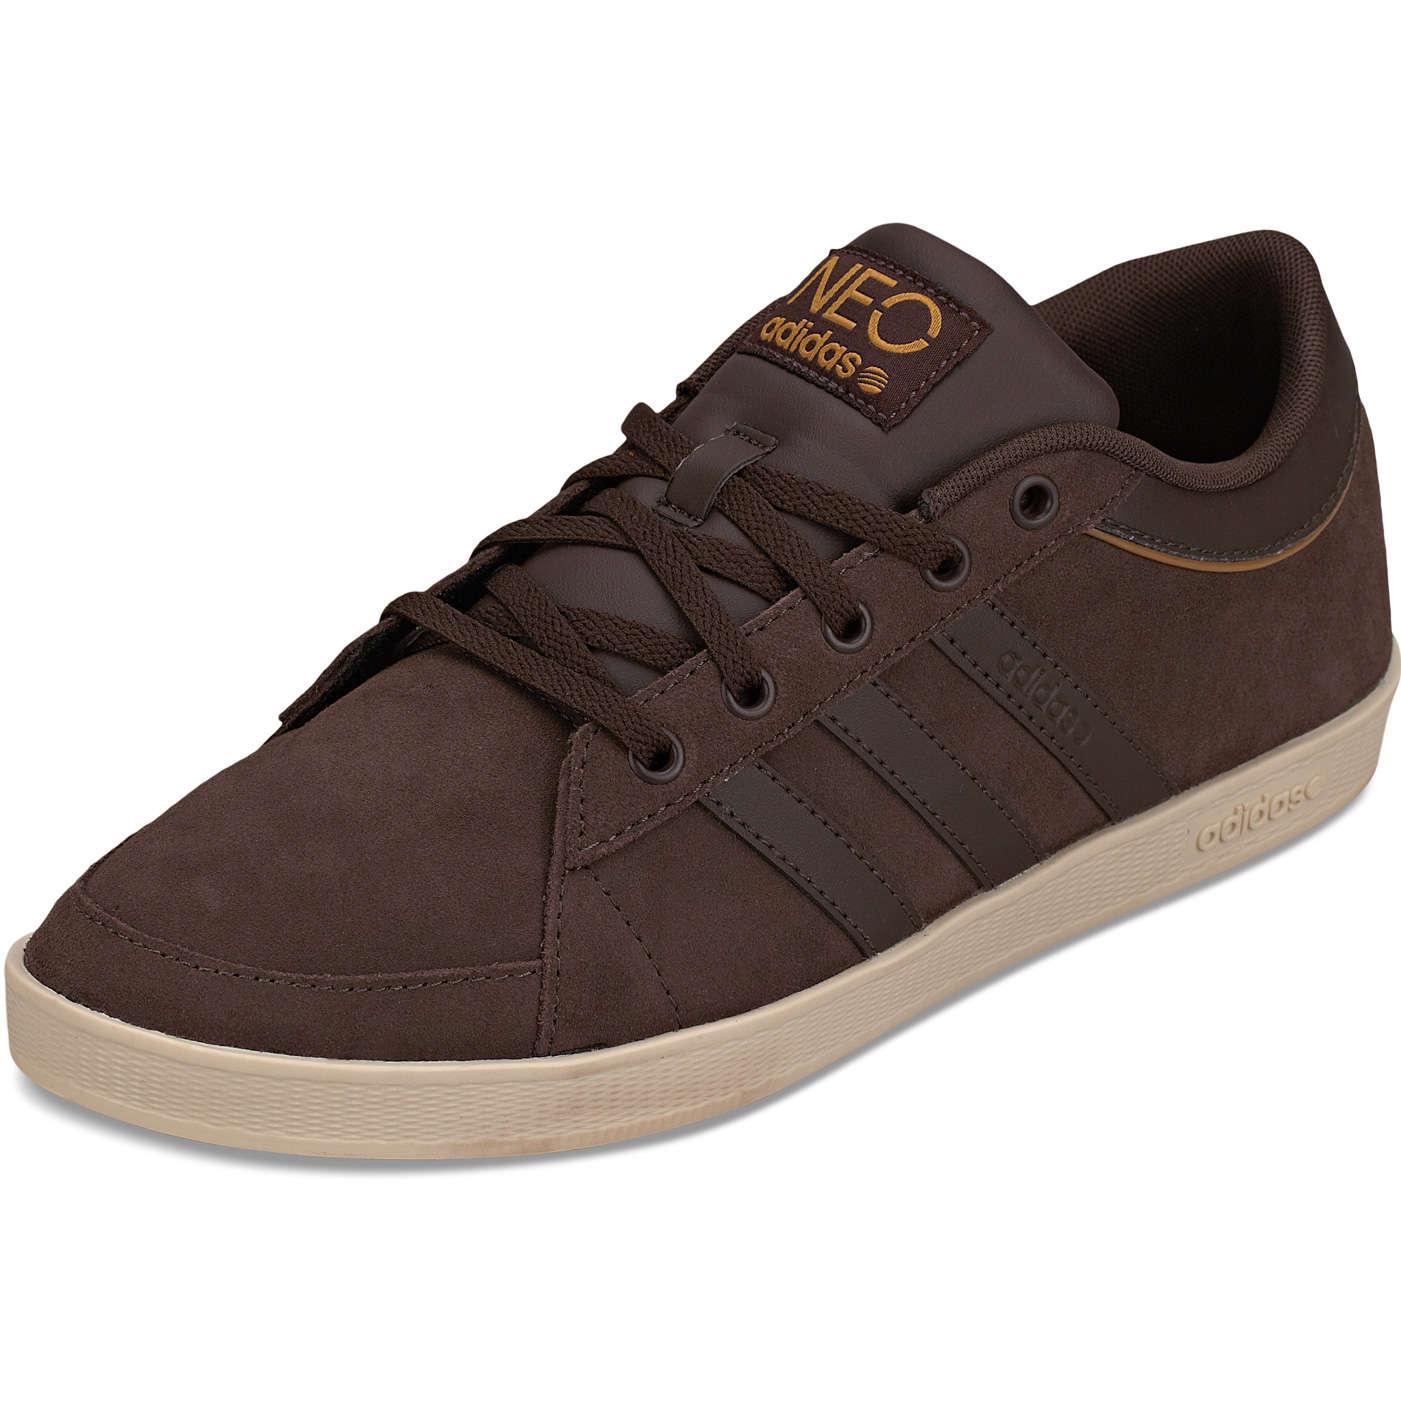 Home Herren Sneakers adidas NEO  Calneo Laidback Lo M  braun